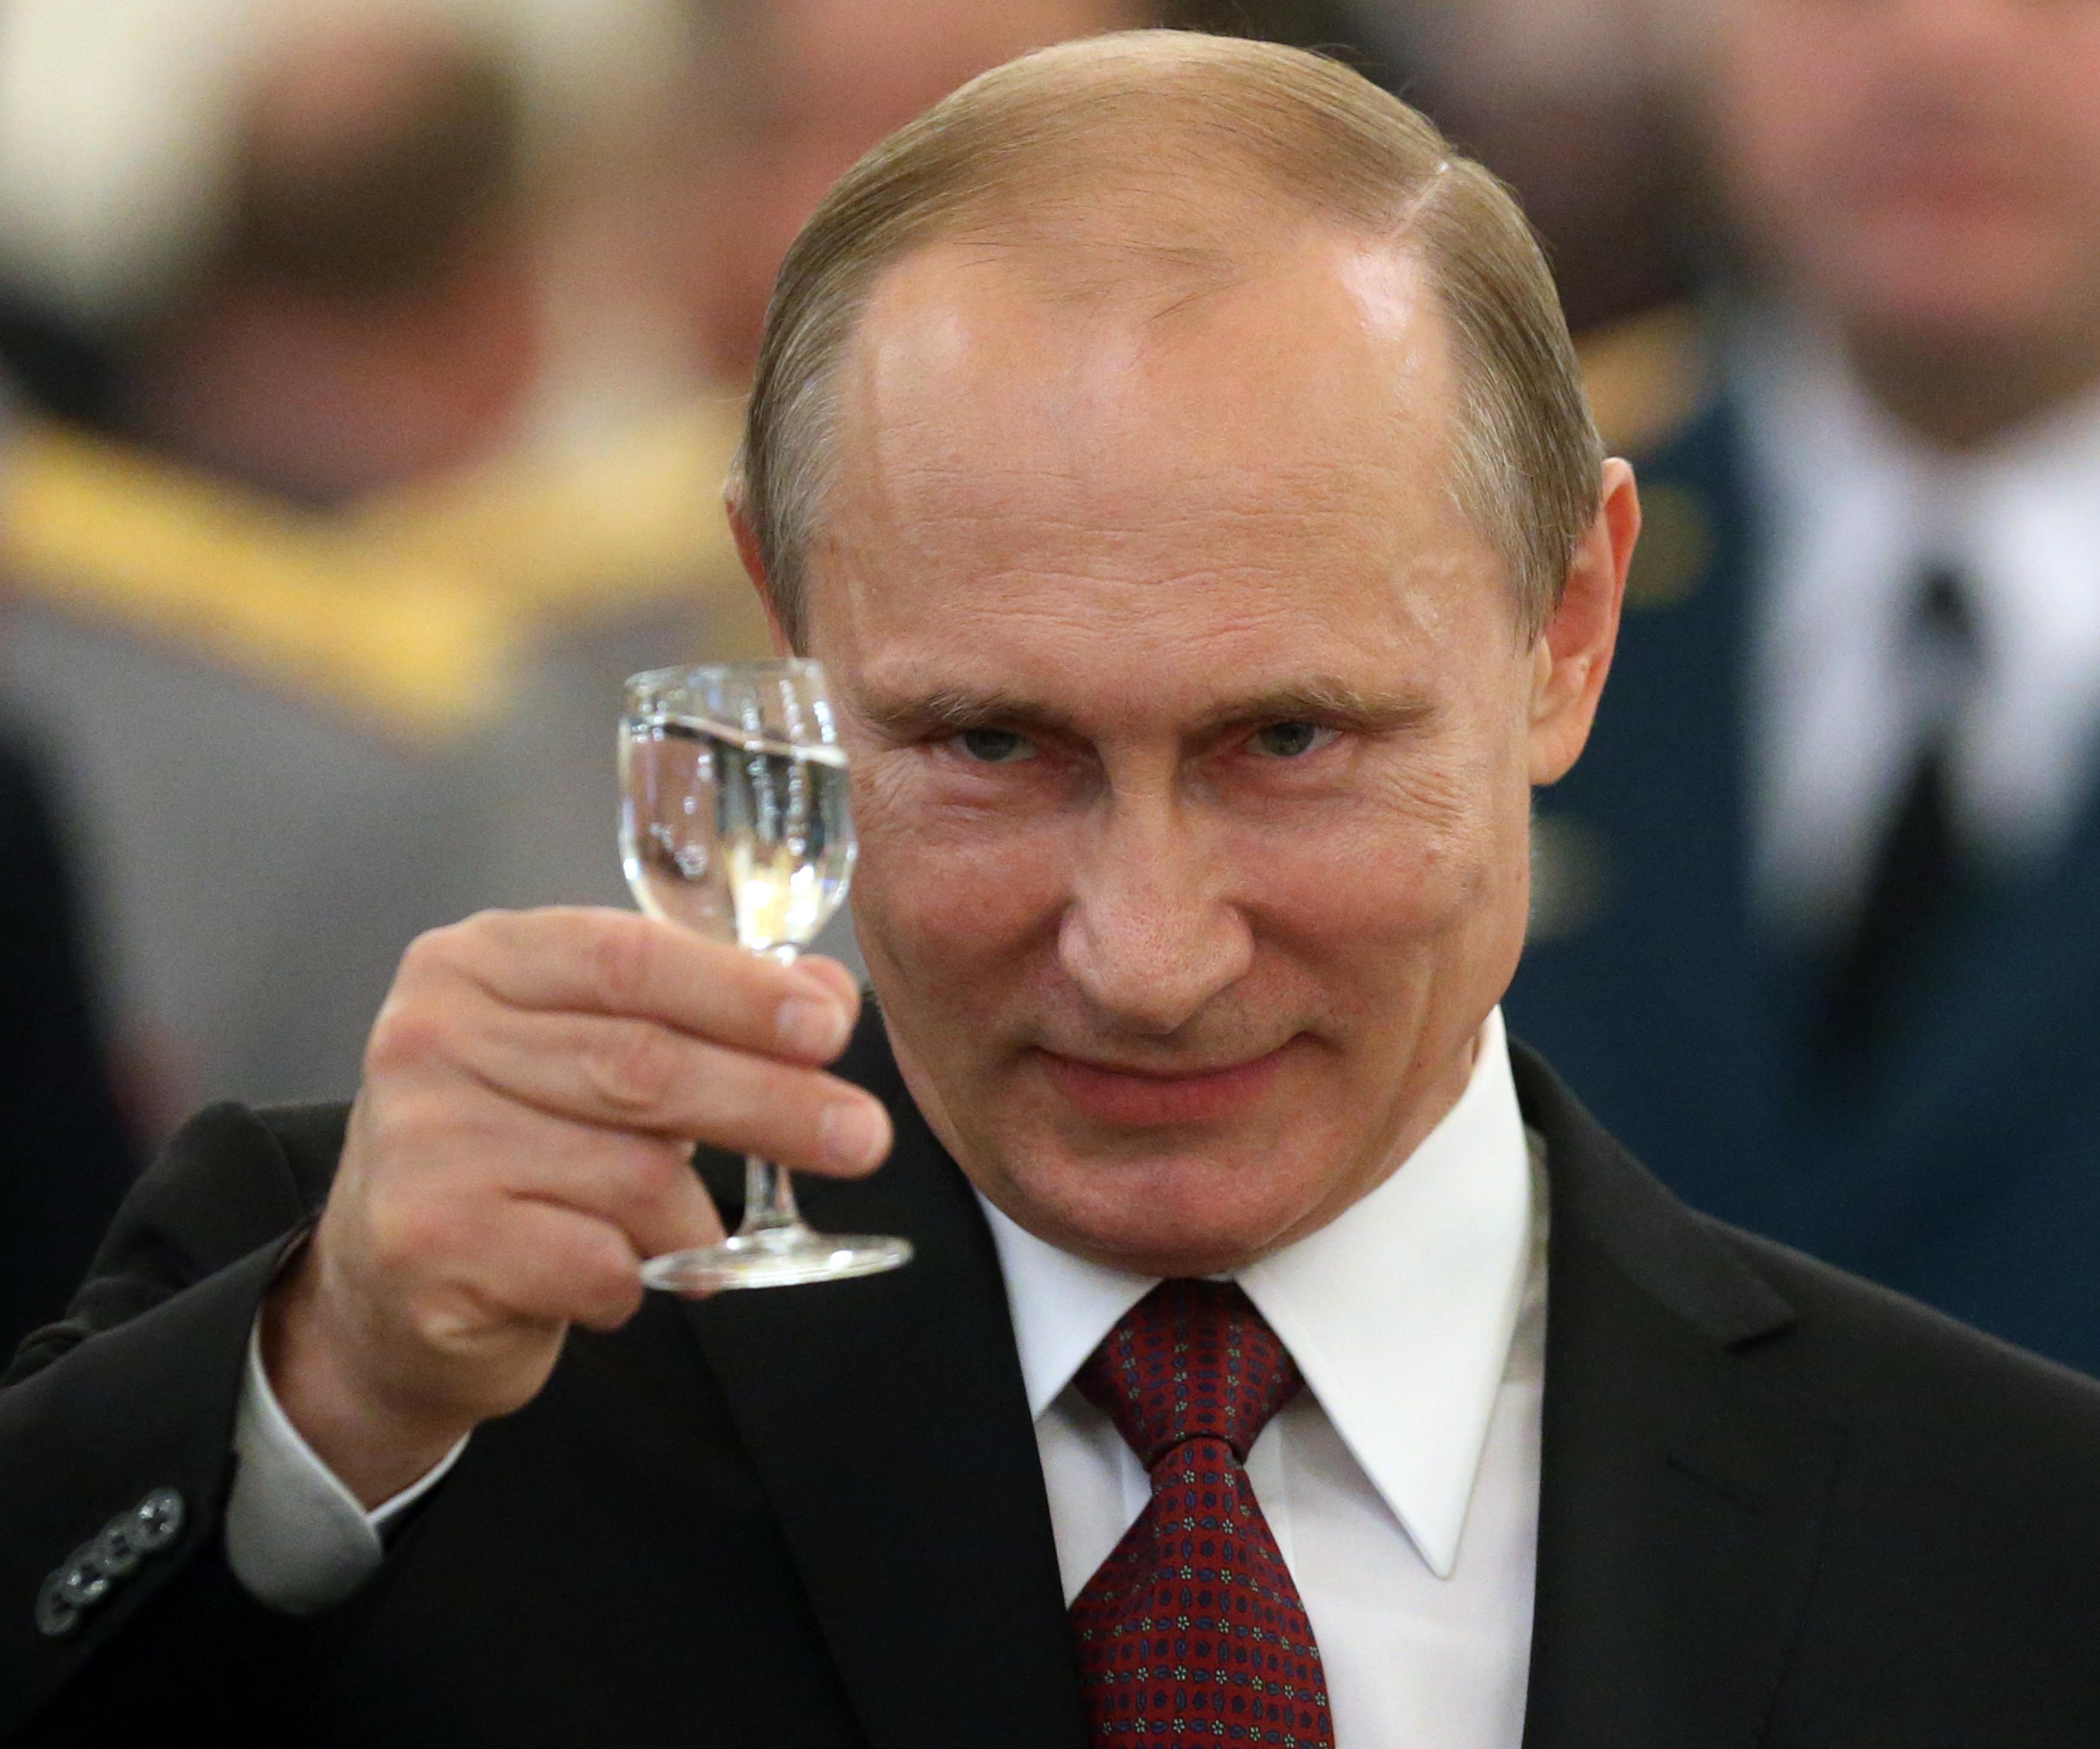 Russian President Vladimir Putin Attends Reception For Military Academy Graduates